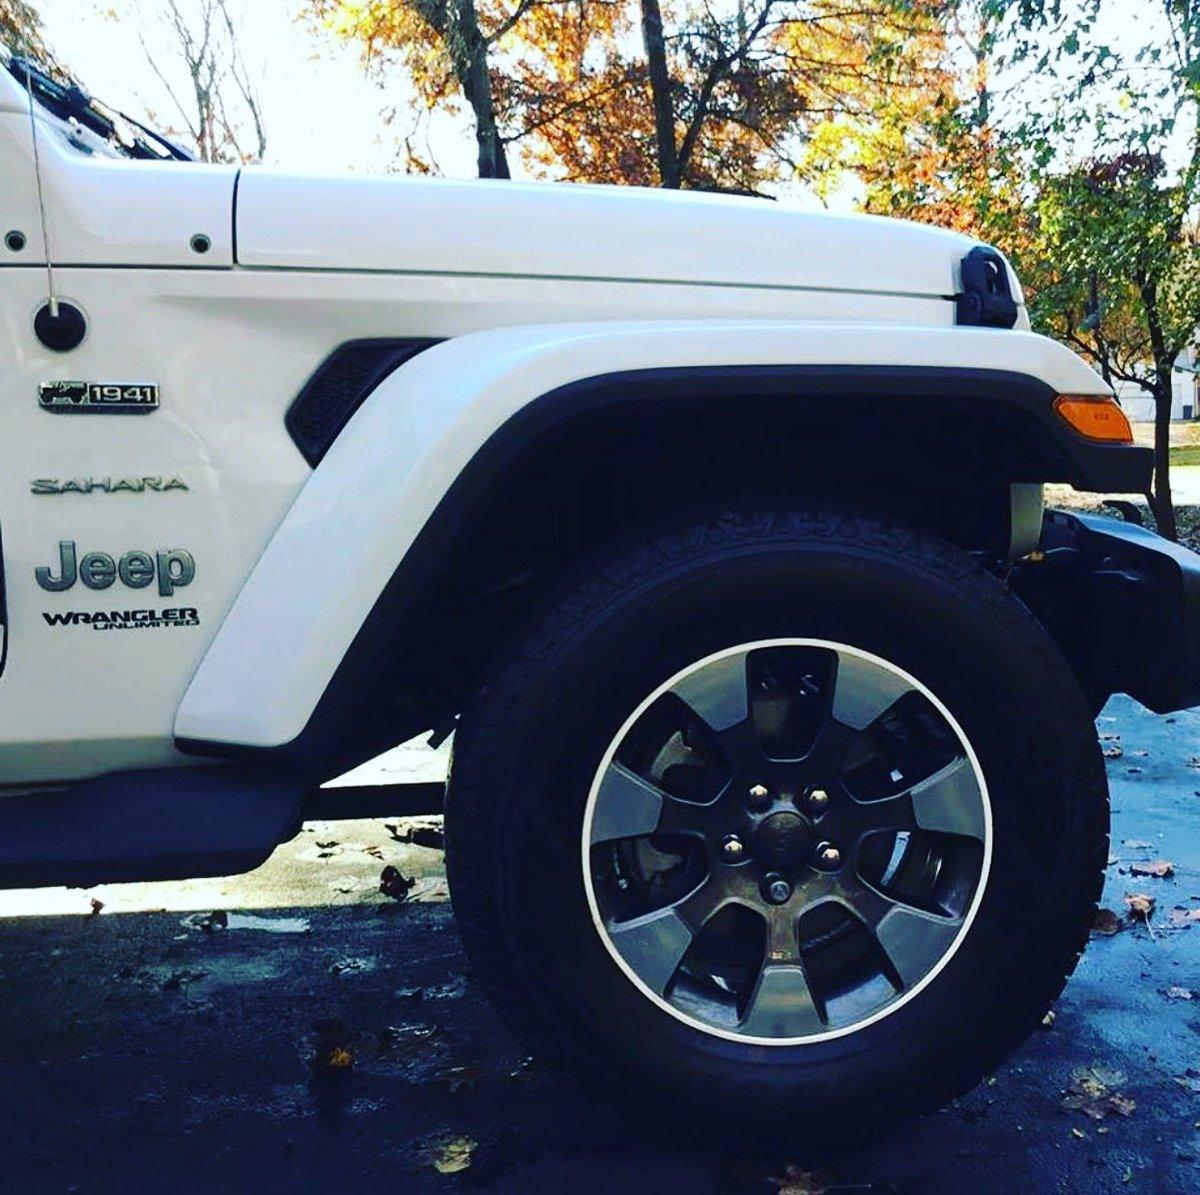 Rimblades Ltd On Twitter Love This Jeep Wrangler With White